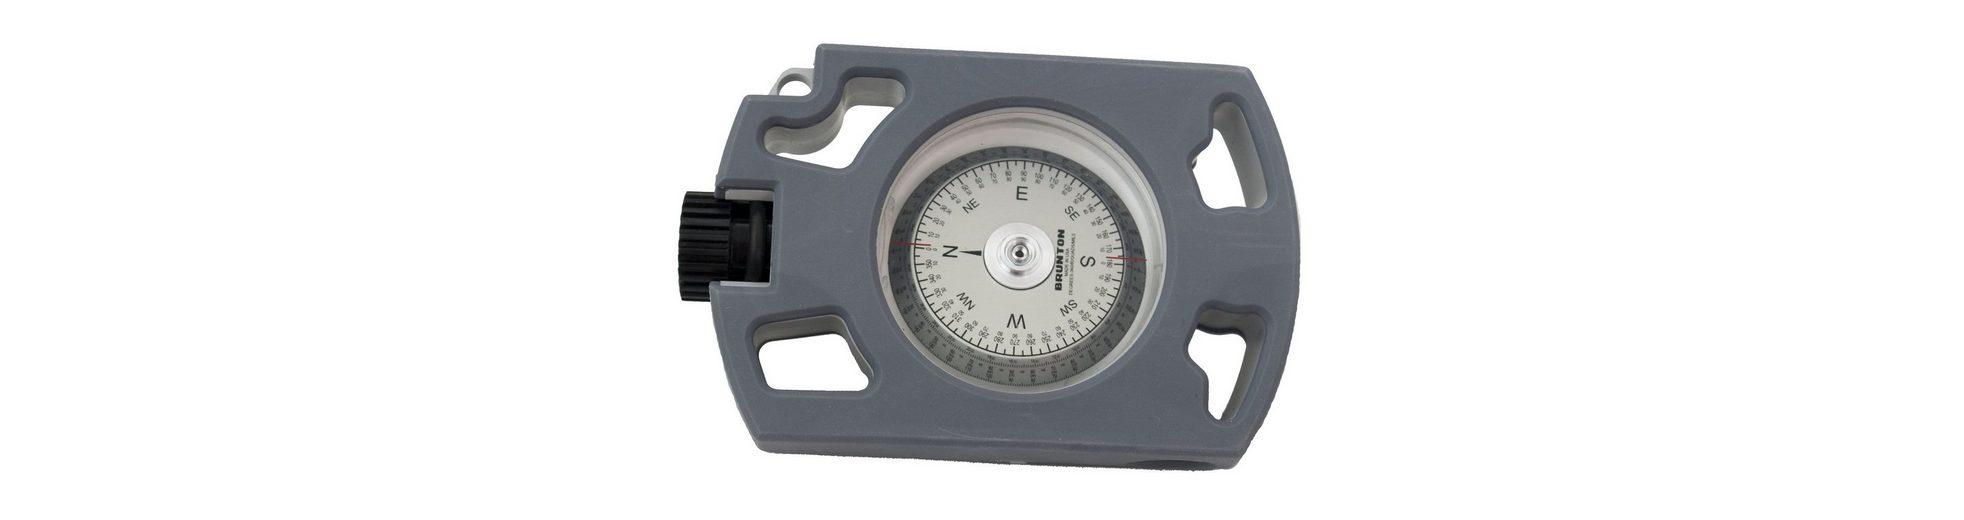 Brunton Kompass »Omni-Sight Sighting Compass (includes all scales)«